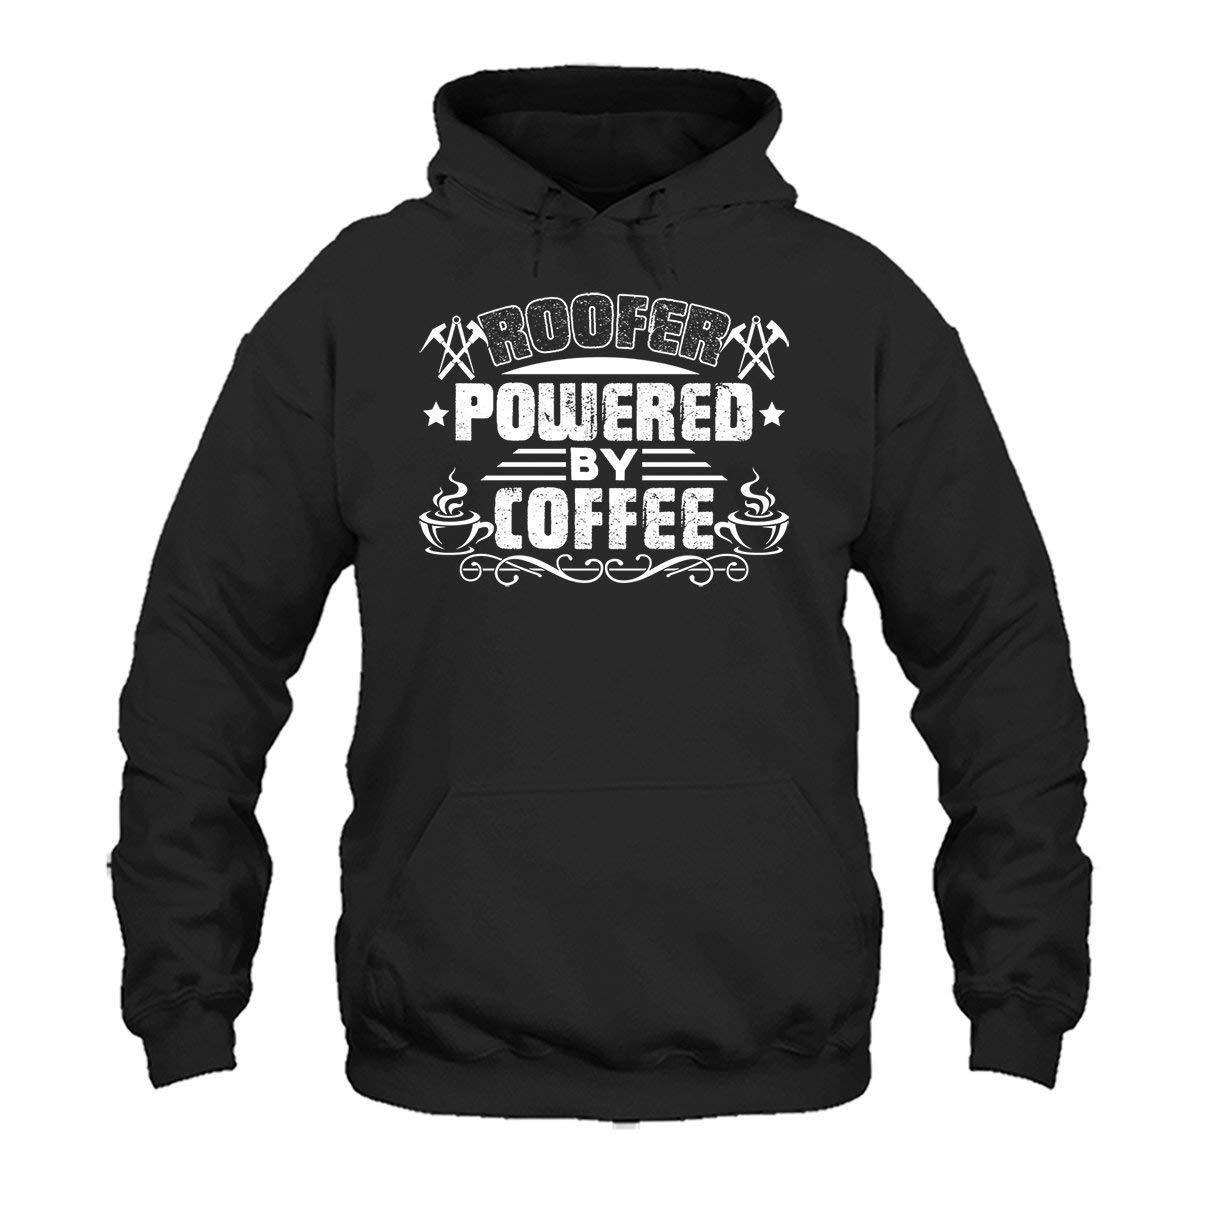 Two Camel Roofer Powered by Coffee Tee Shirt Cool Sweatshirt Hoodie